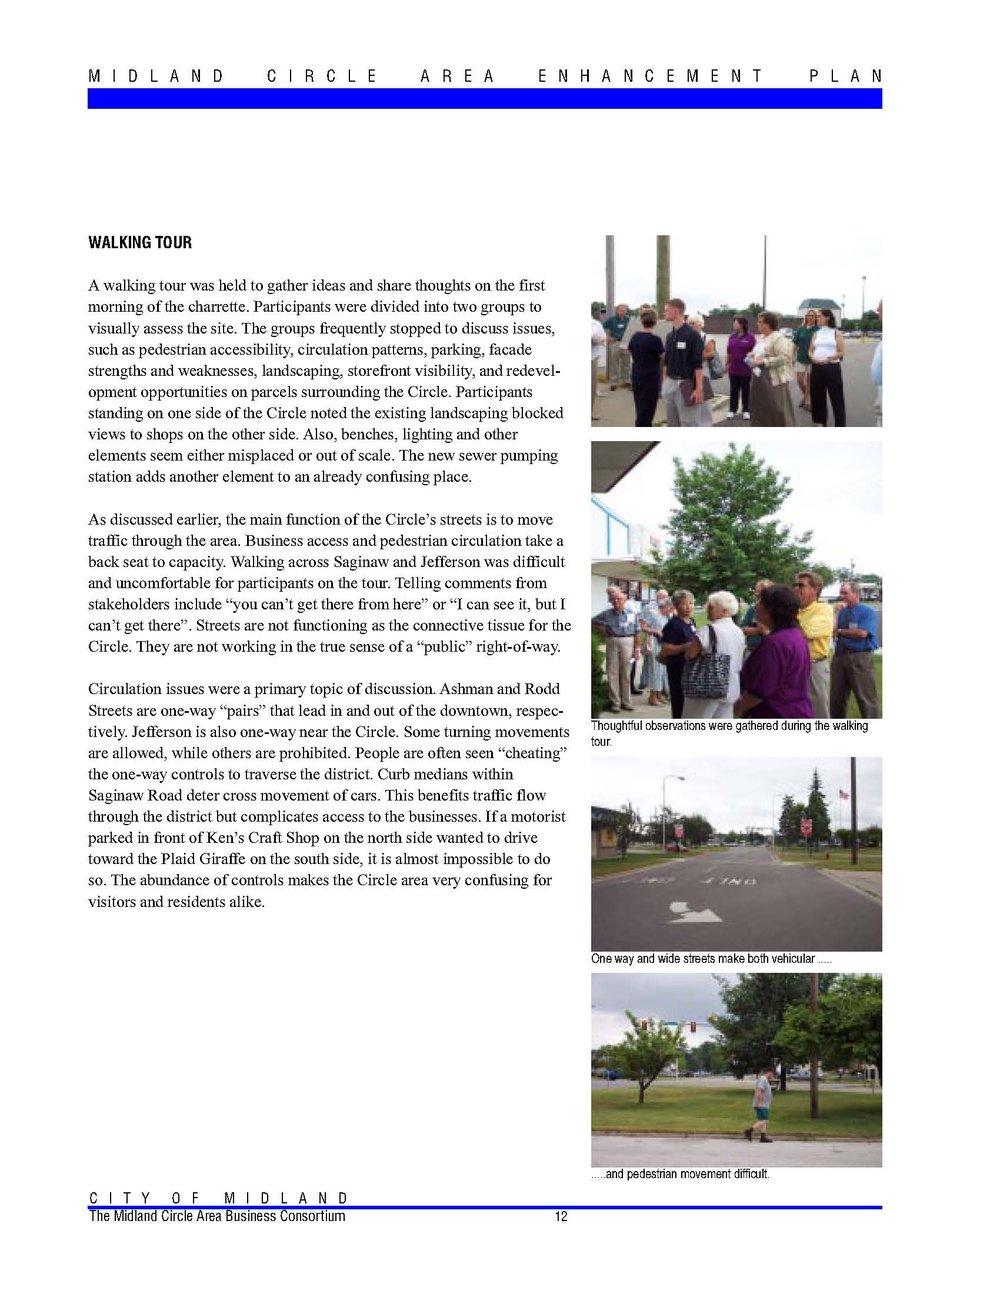 Ashman Circle Enhancement Plan_Page_14.jpg